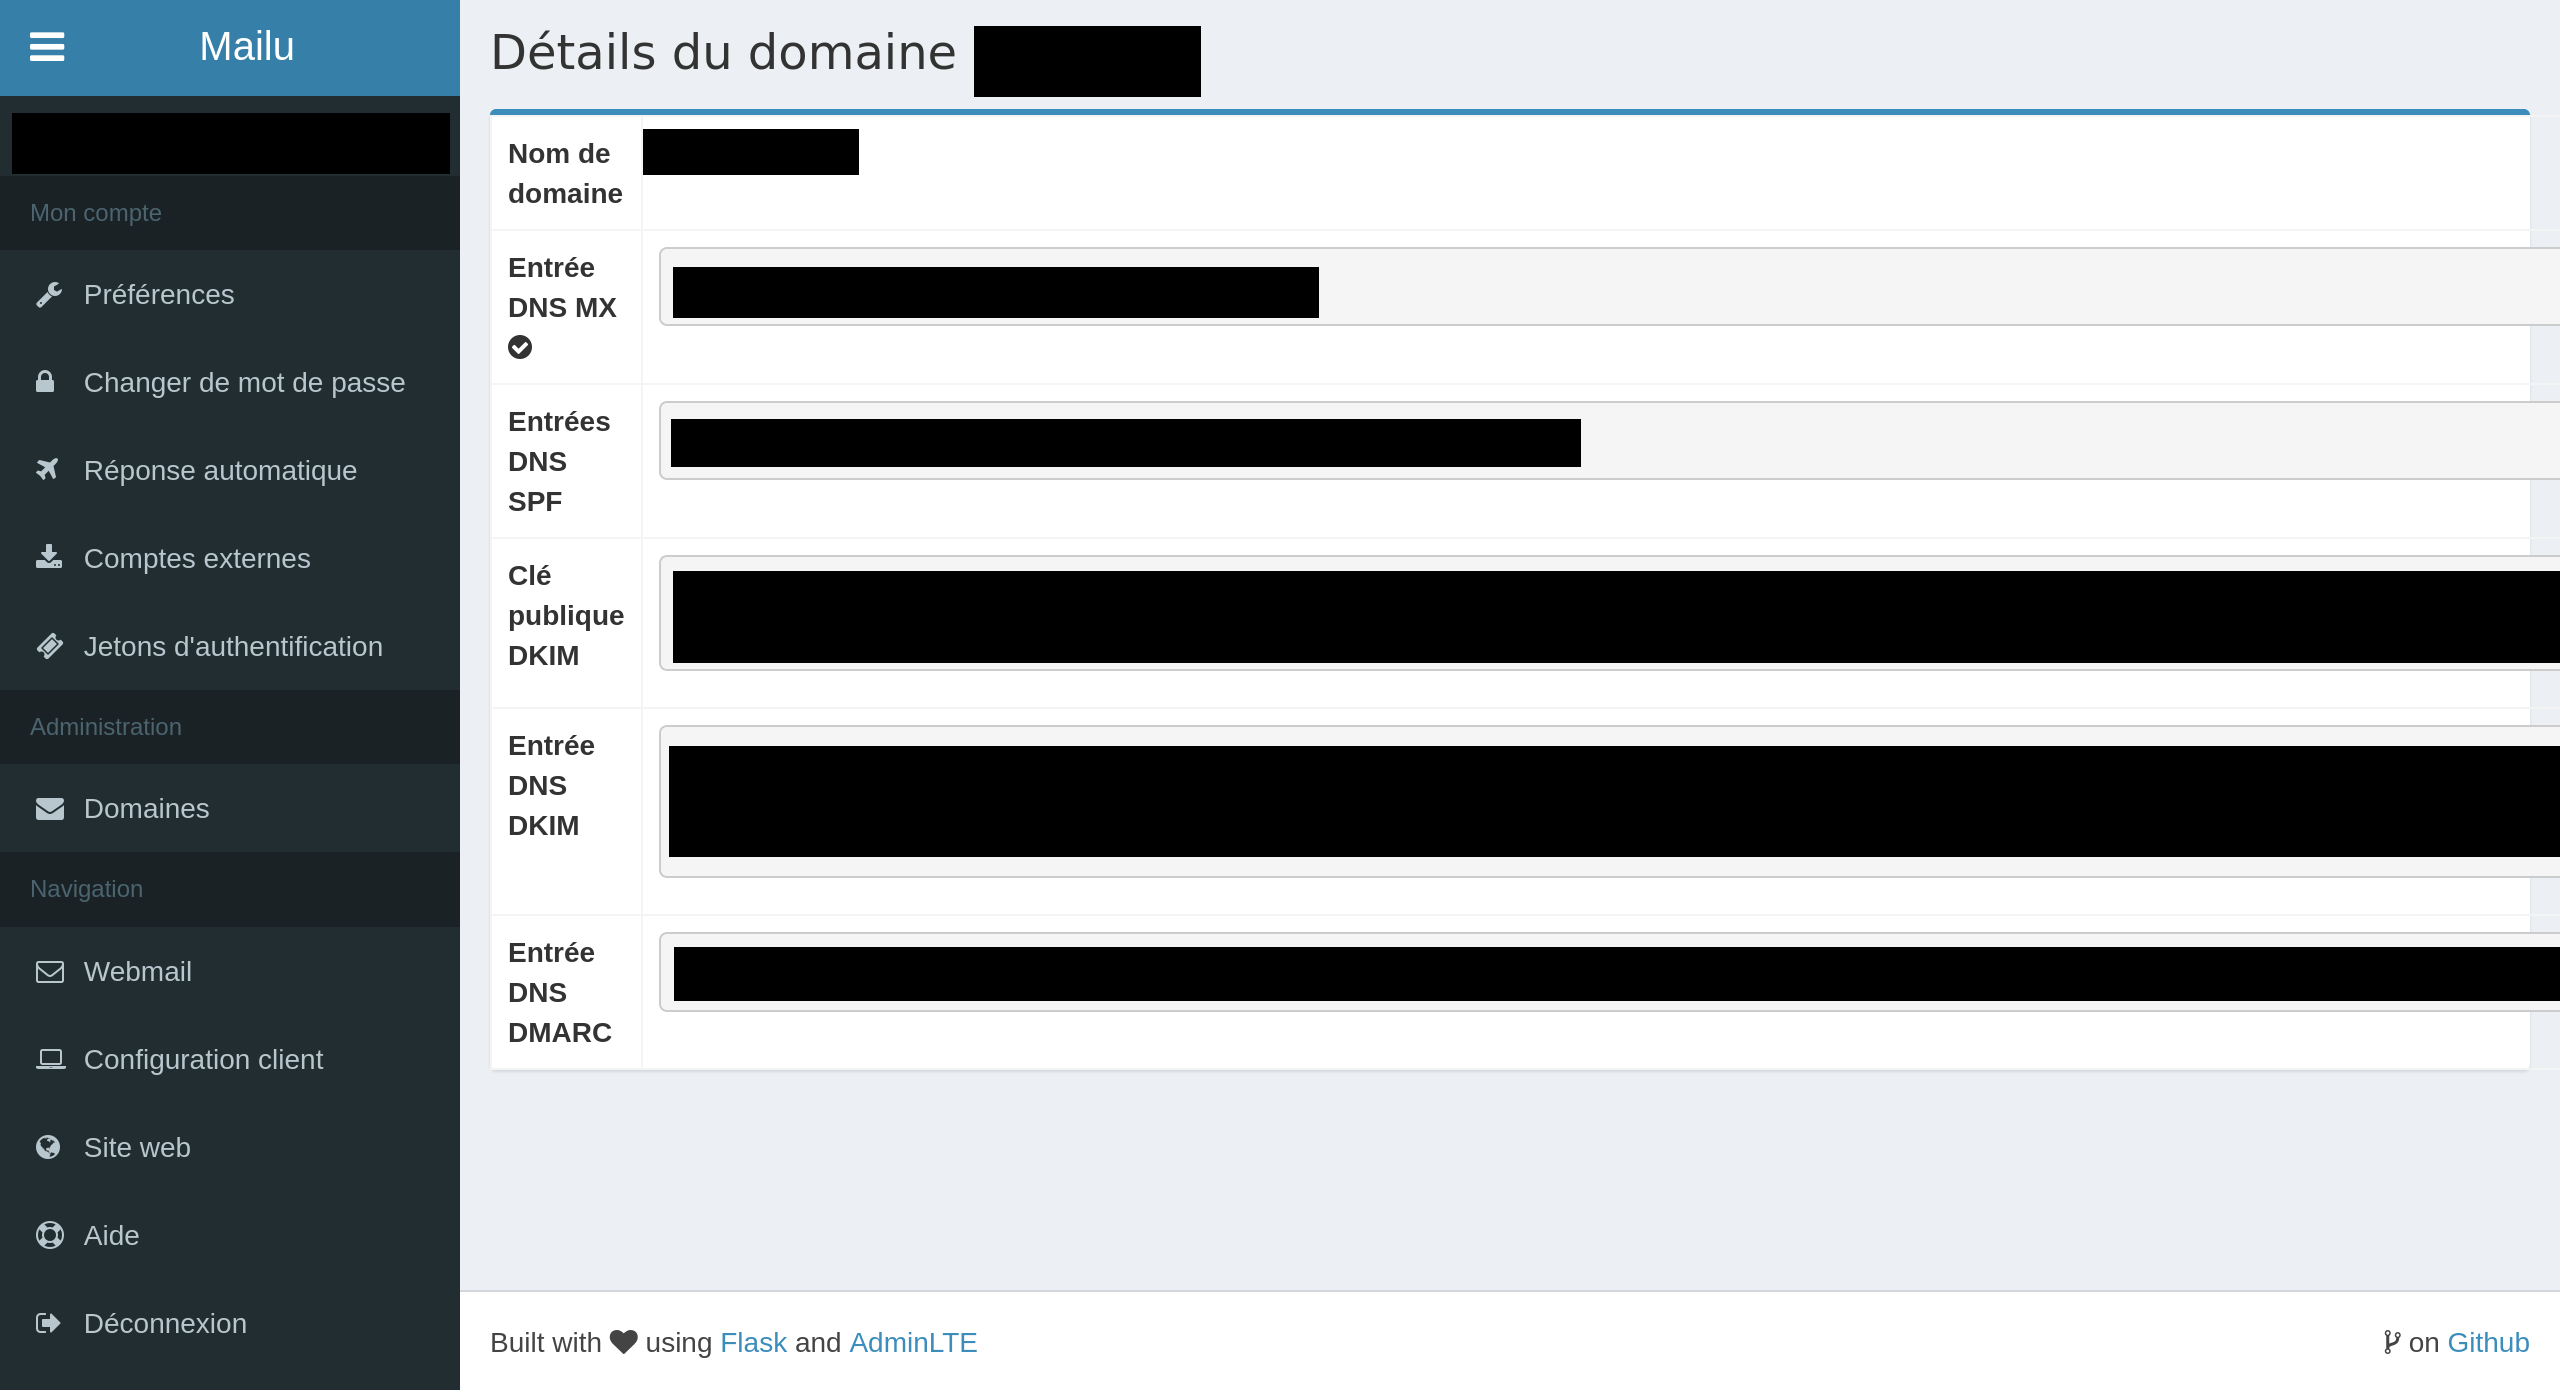 content/service/mailu/images/domain3.png